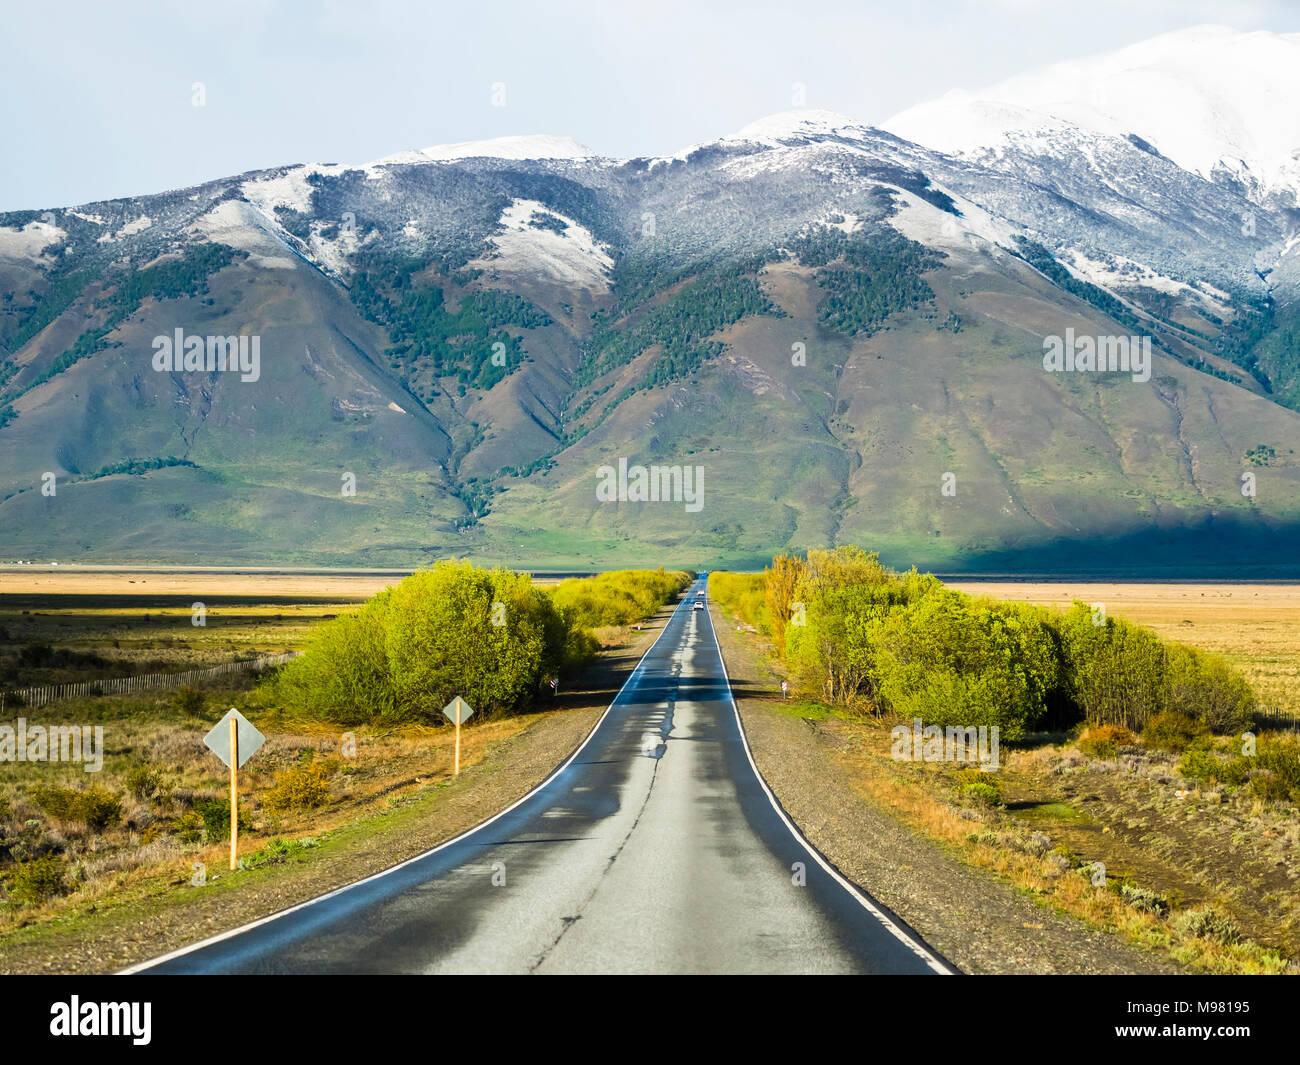 Argentina, Patagonia, El Calafate, Santa Cruz Province, road near Lago-Argentino - Stock Image